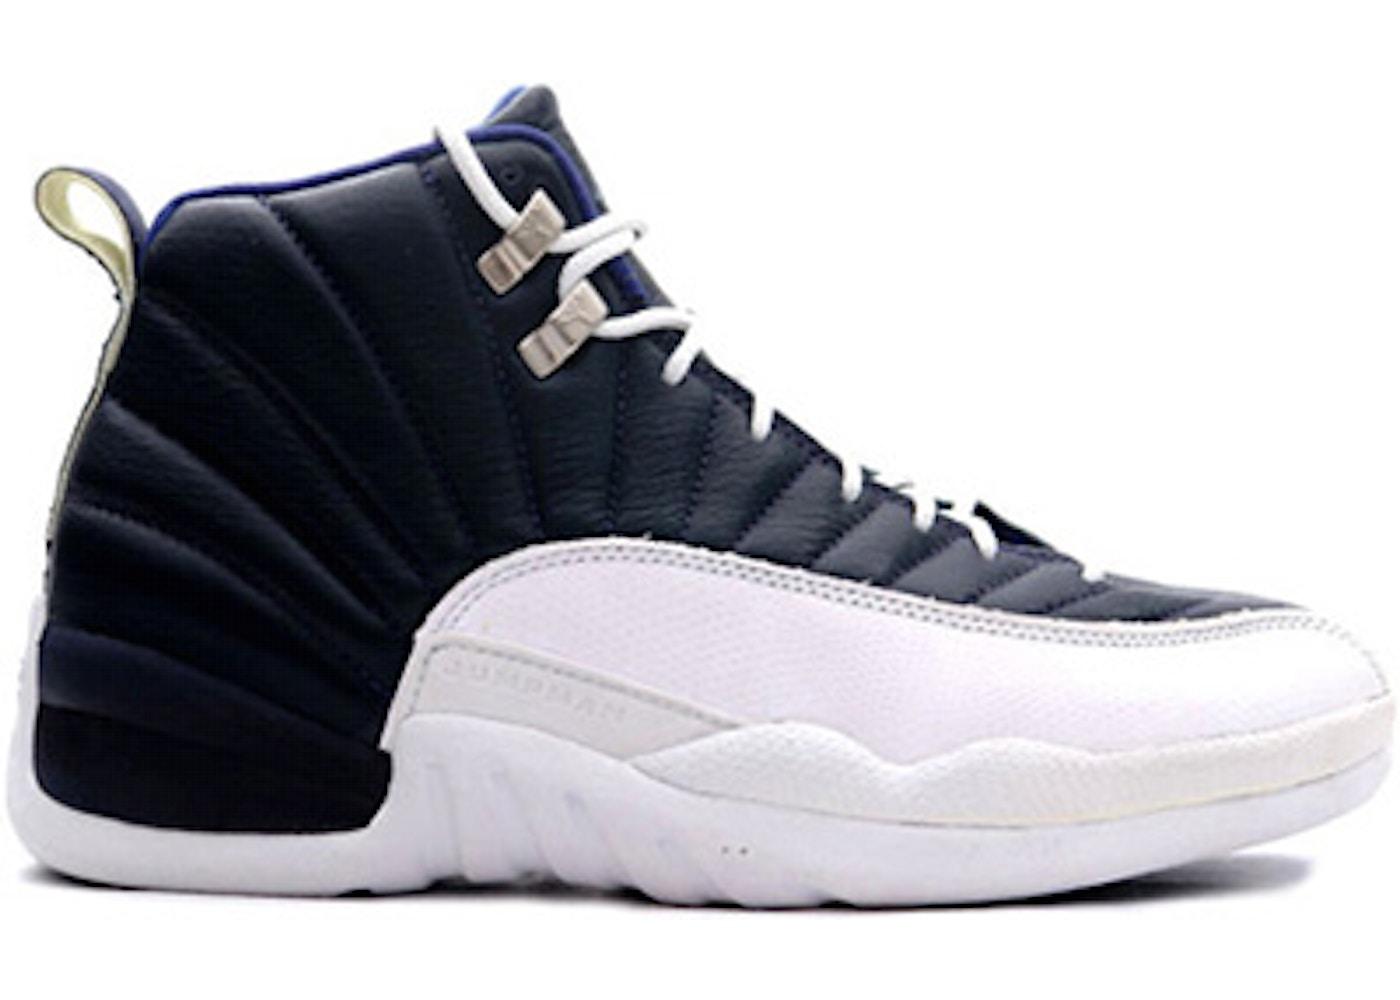 487705278320 Buy Air Jordan 12 Size 16 Shoes   Deadstock Sneakers